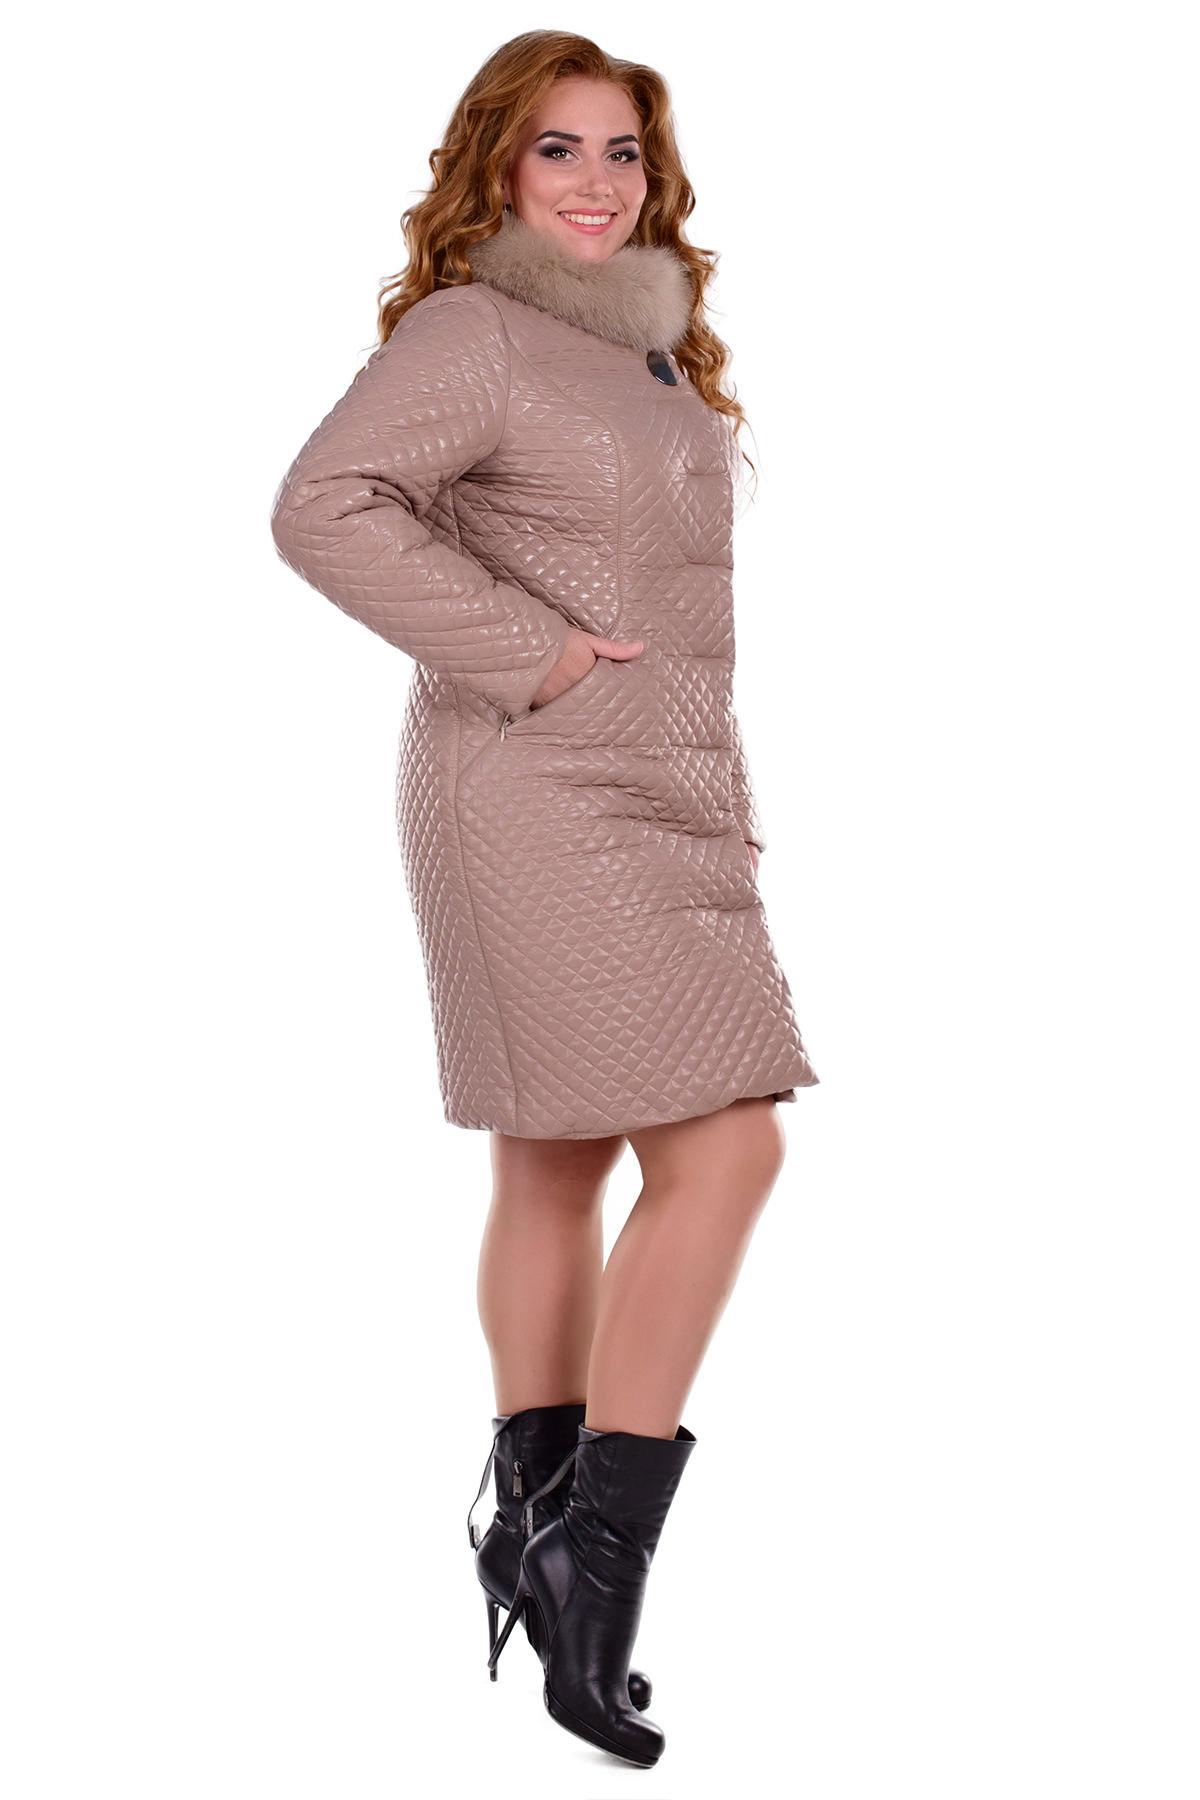 Пальто Donna зима Андрия 0317 Цвет: Бежевый 30